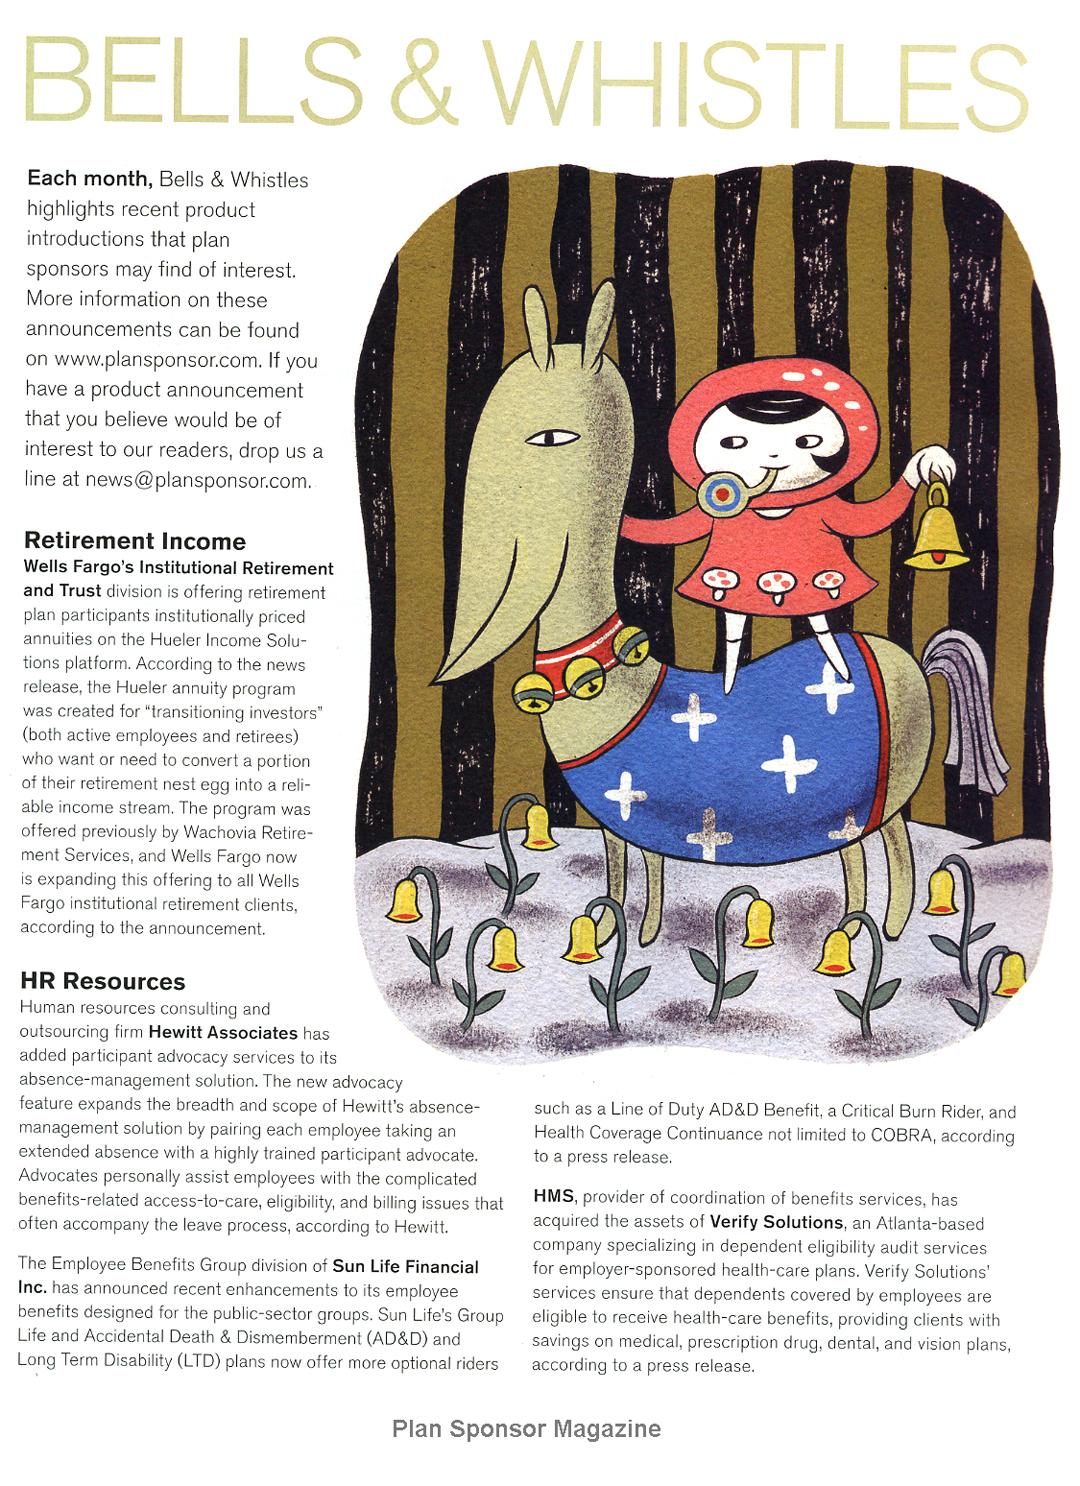 PlanSponsor Magazine